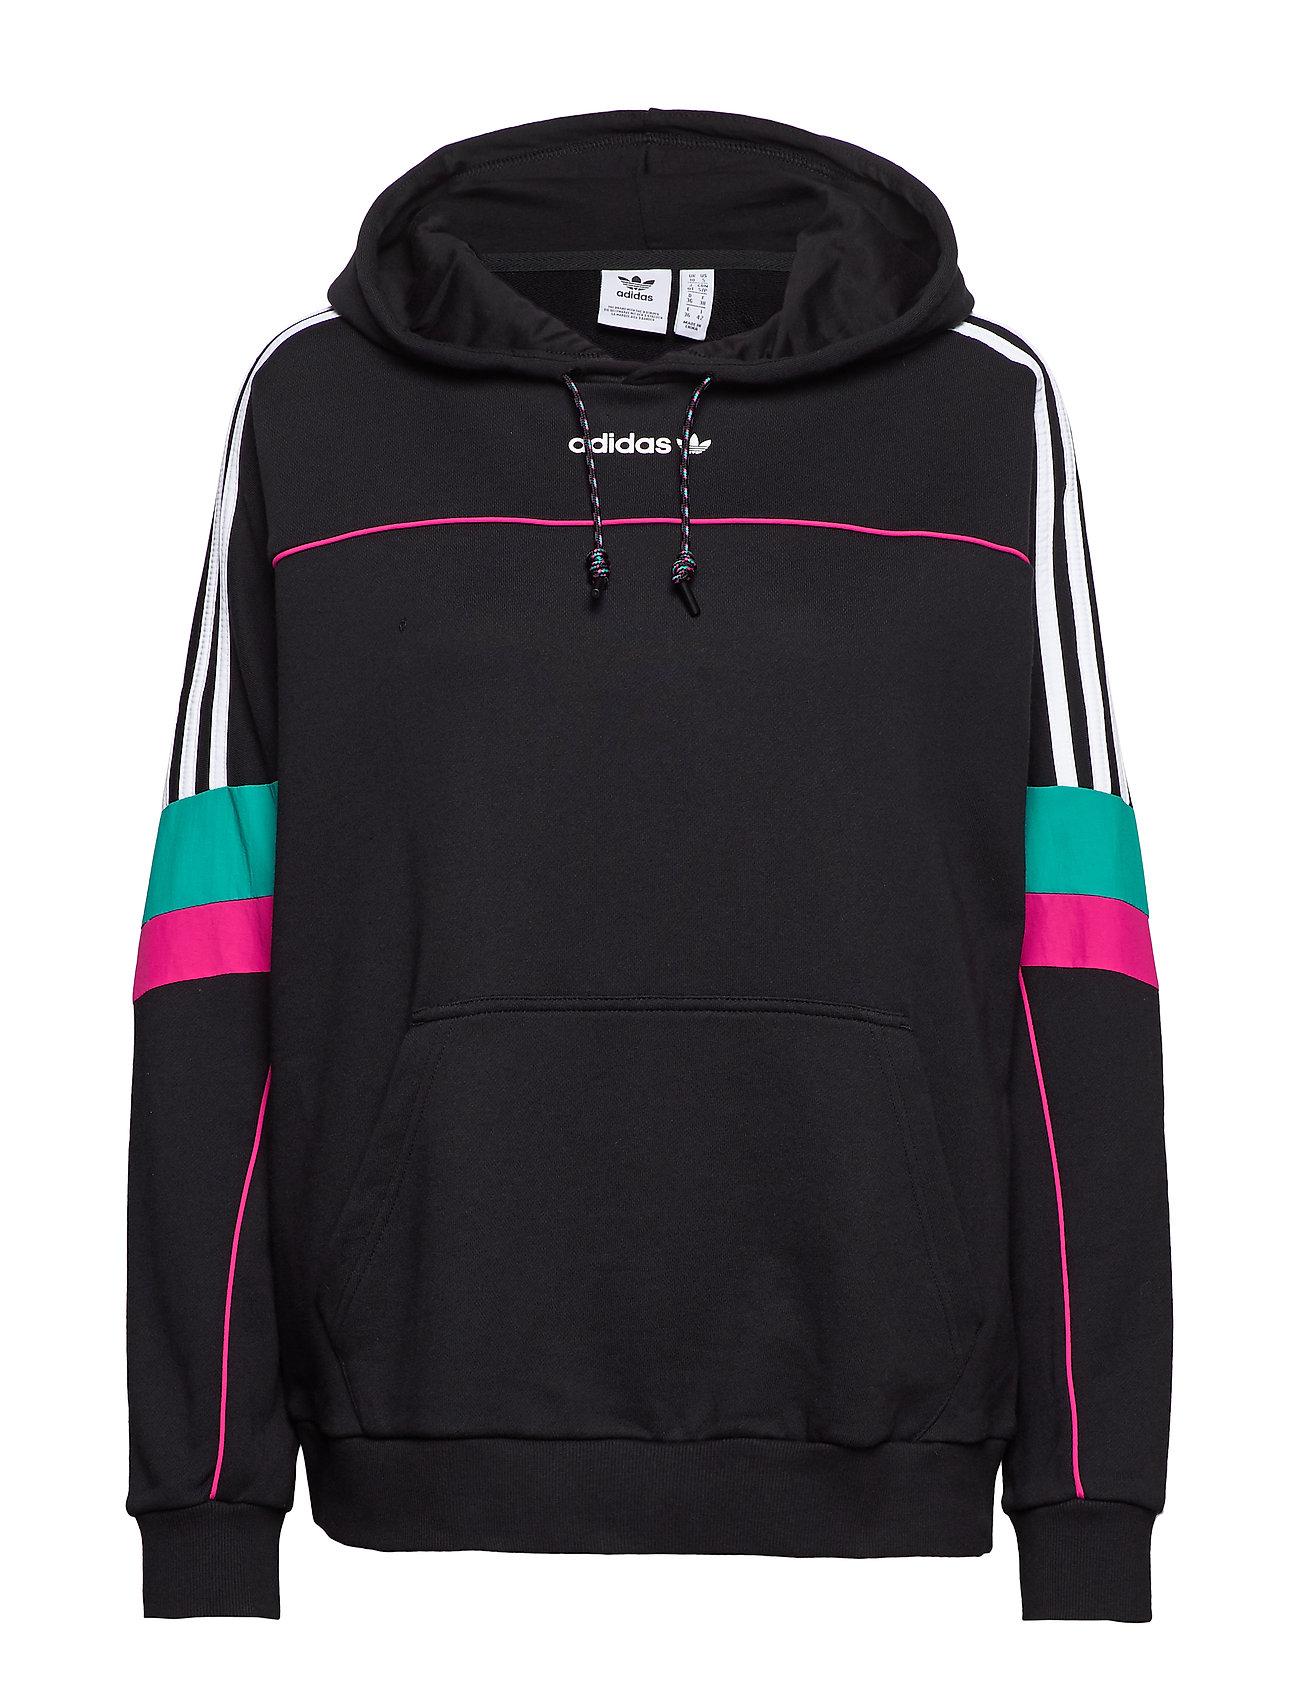 adidas Originals BF HOODIE - BLACK